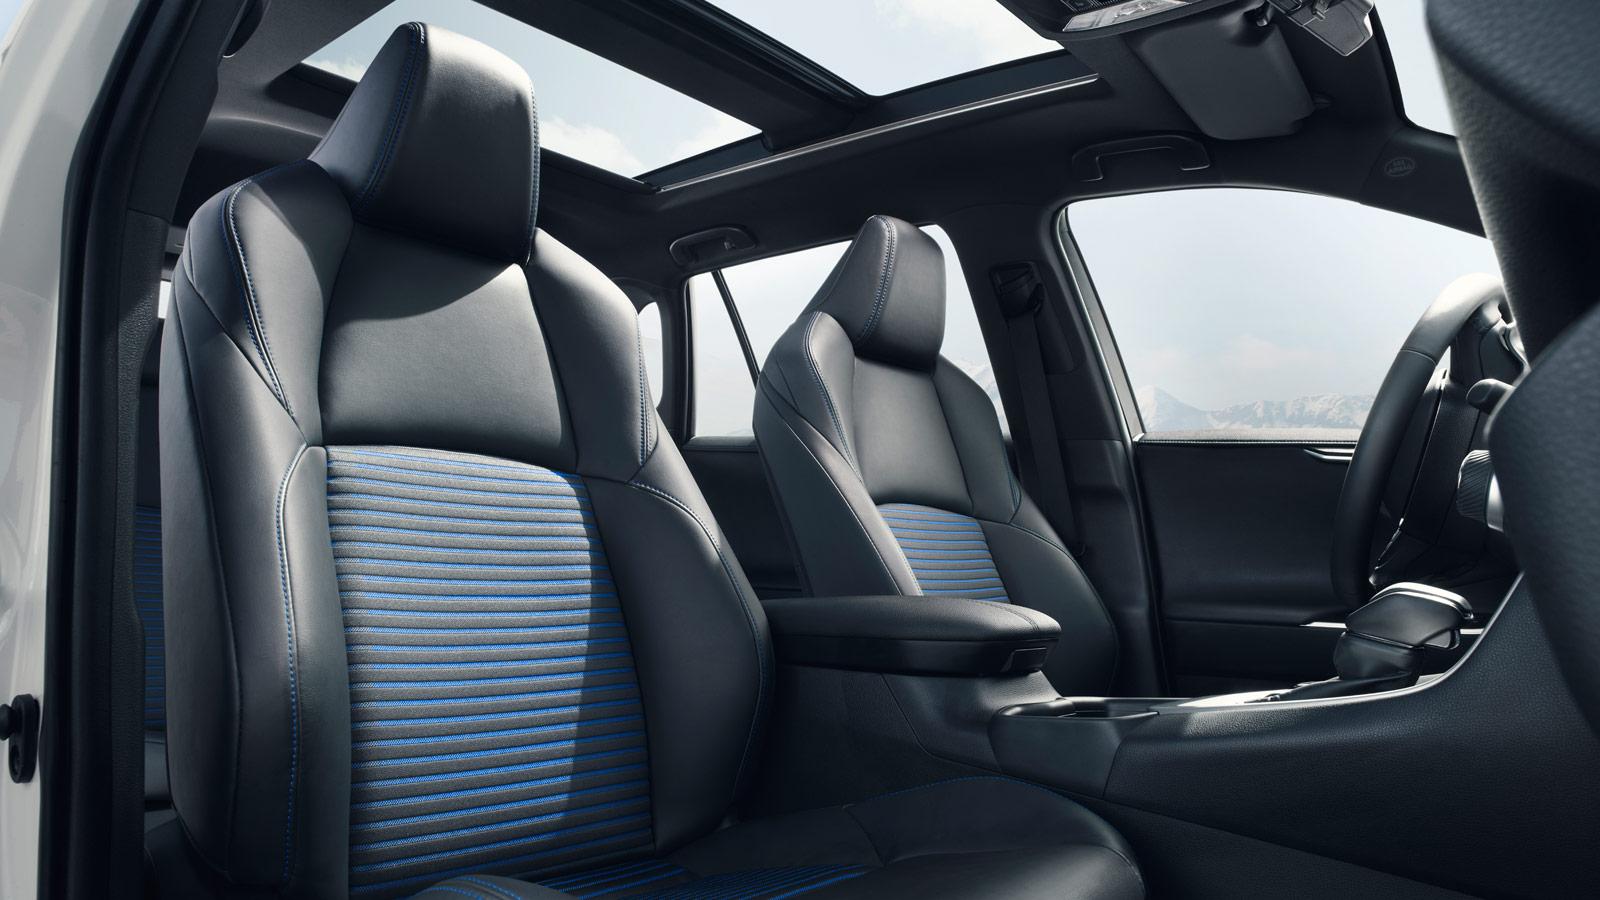 Toyota RAV4 Owners Manual: Seat belts